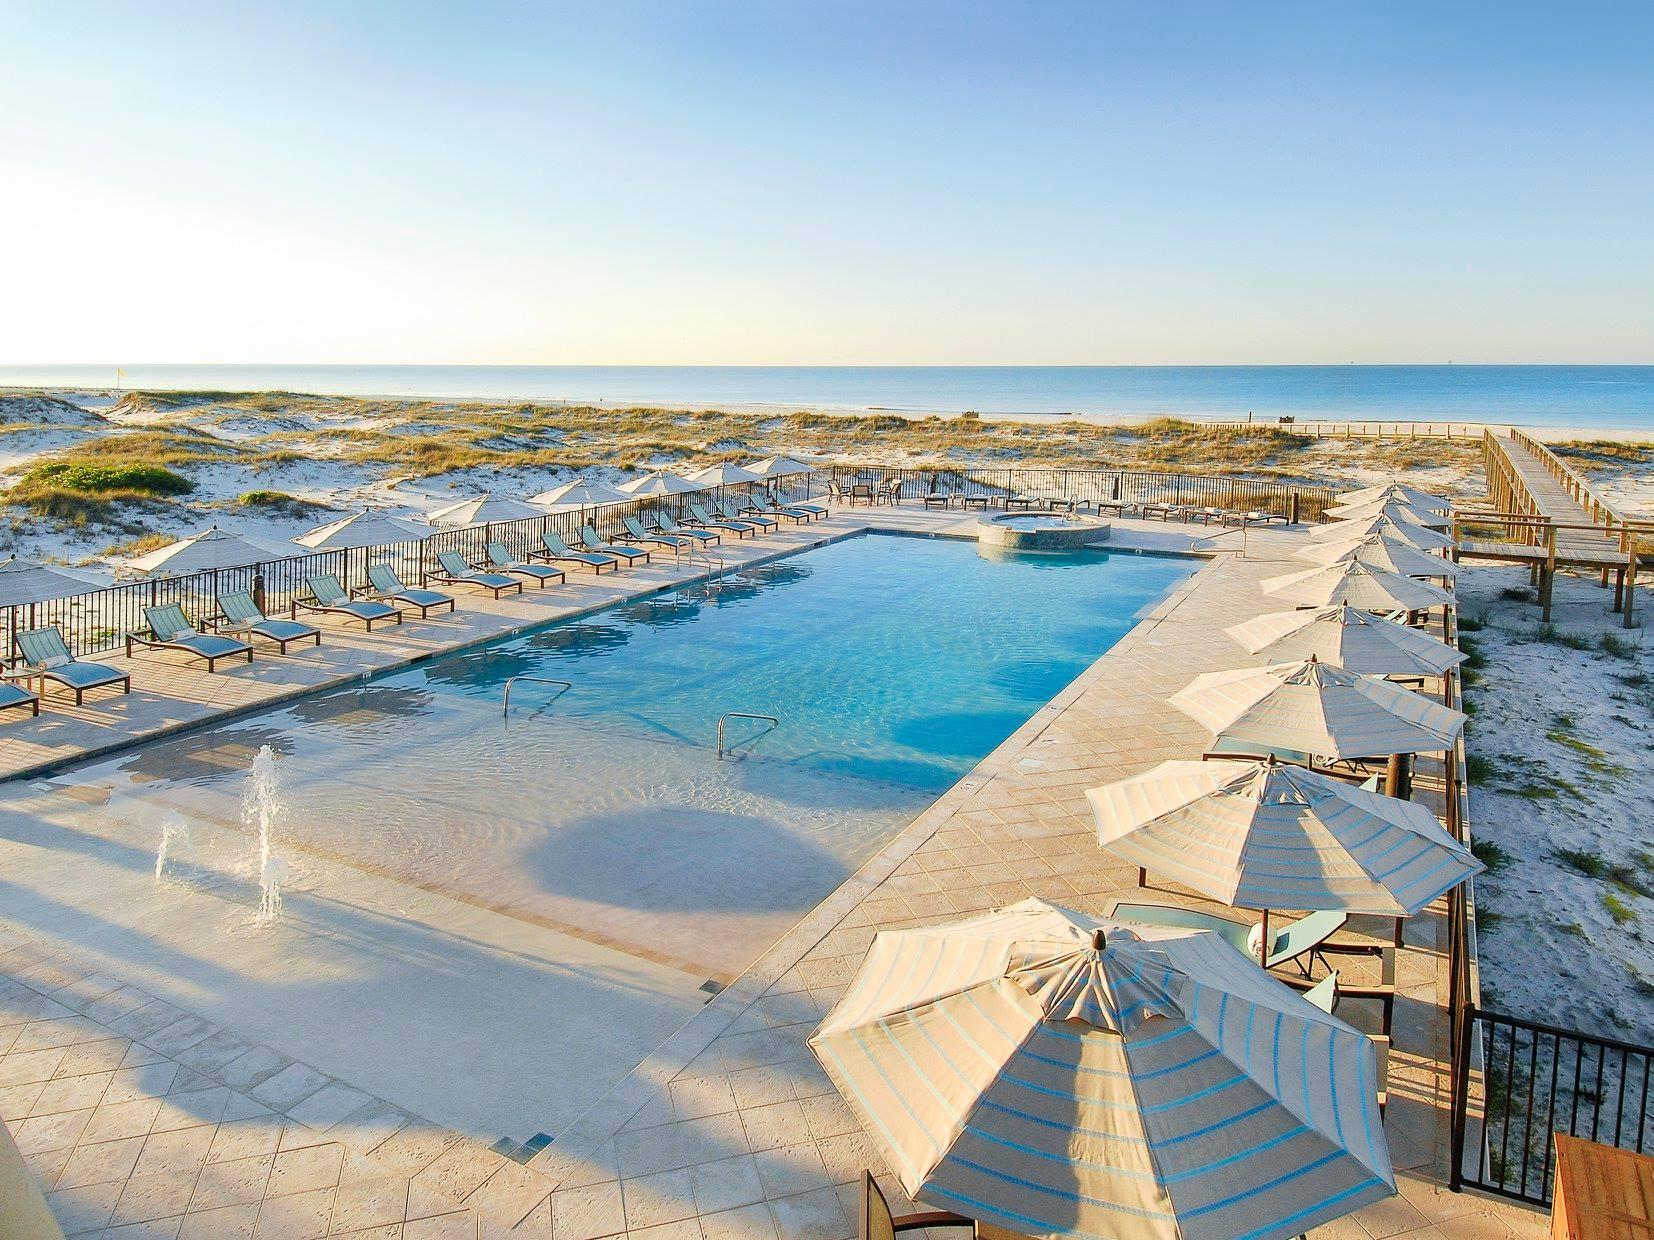 Kiva Dunes Golfing Resort Gulf Shores Alabama Beachside Pool